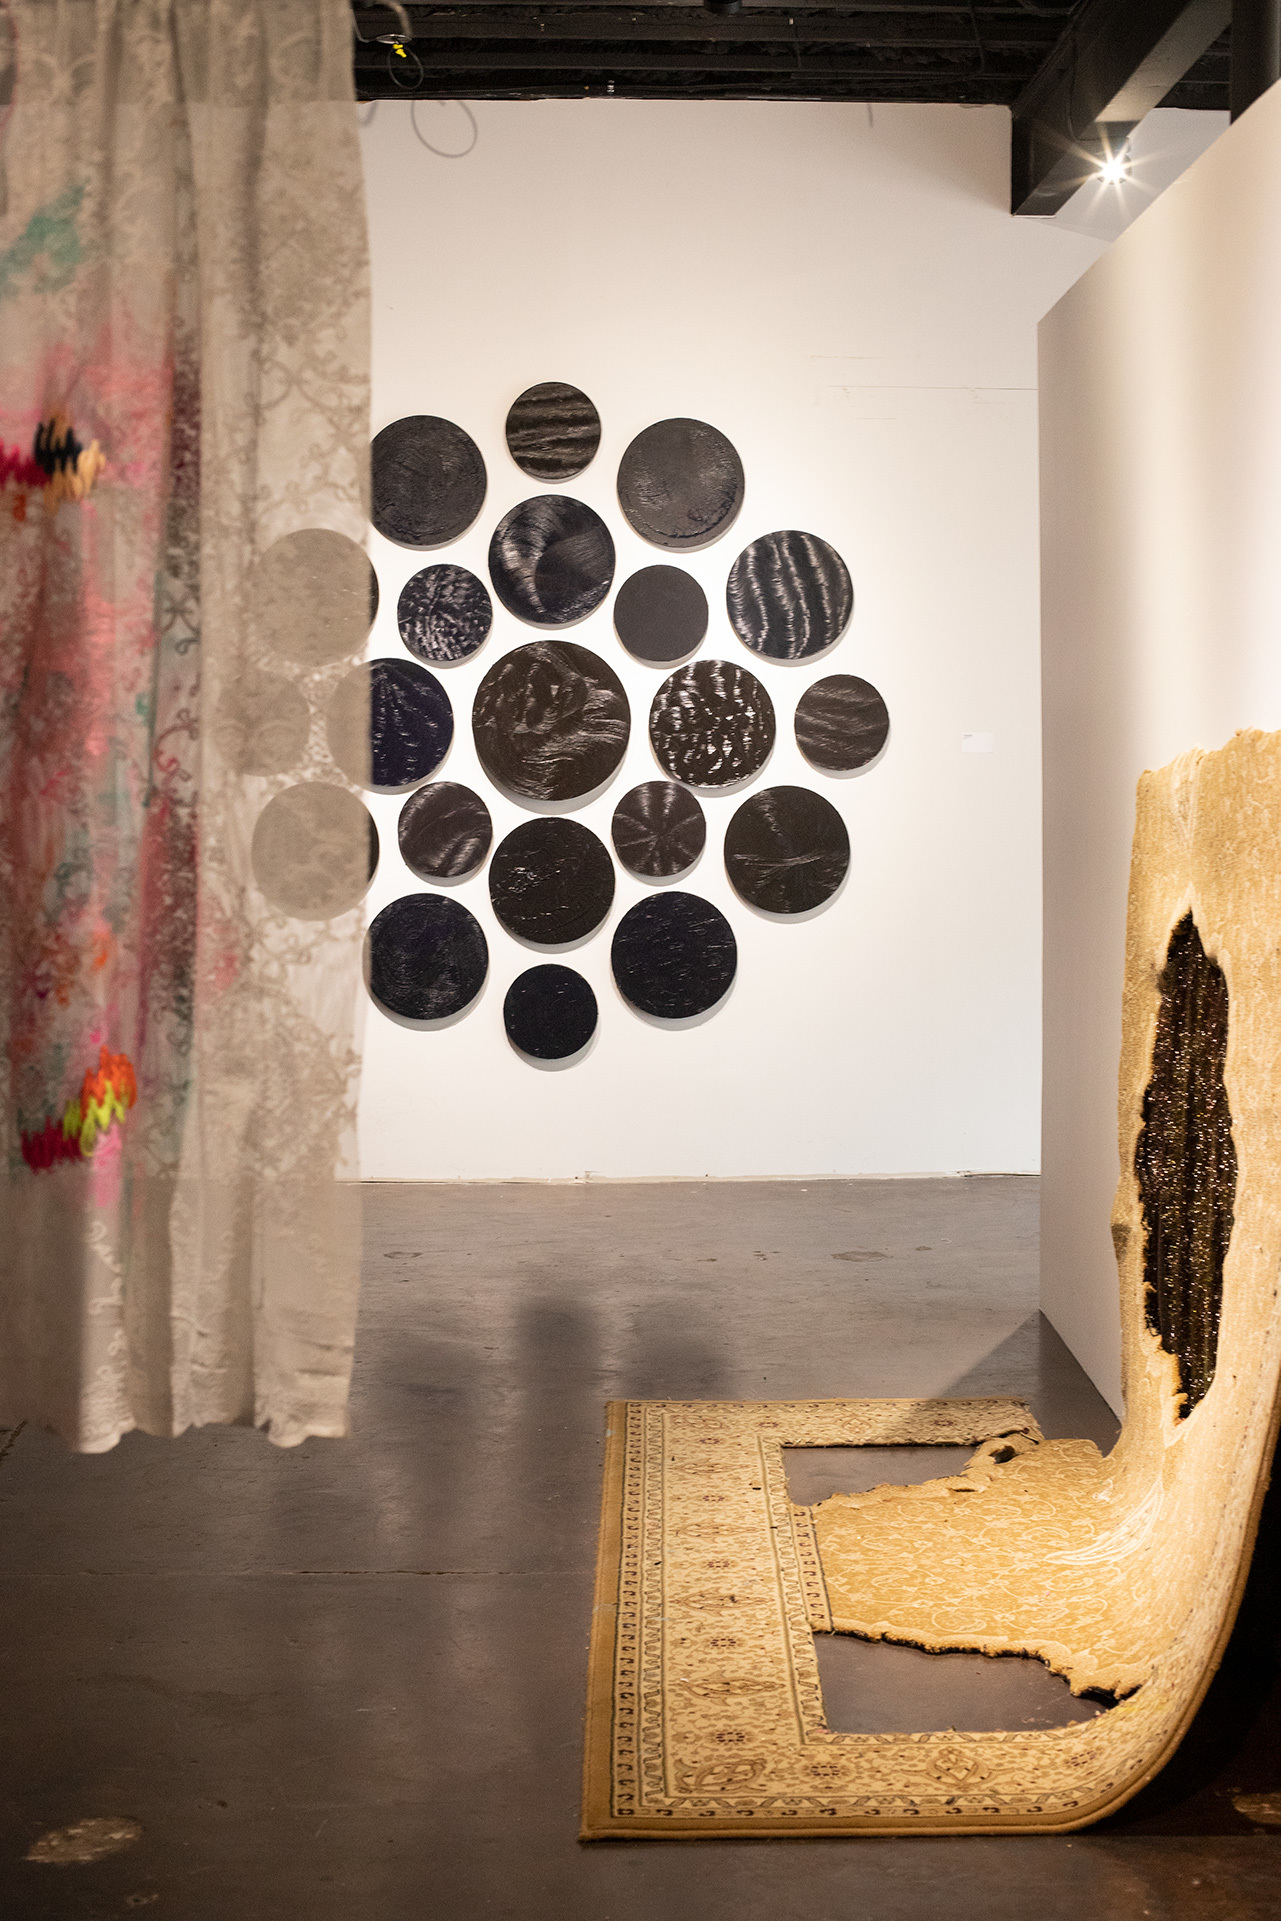 Gallery Visit, MOCAN, May 2021 (feat. Nuveen Barwari, Ashanté Kindle, and more)